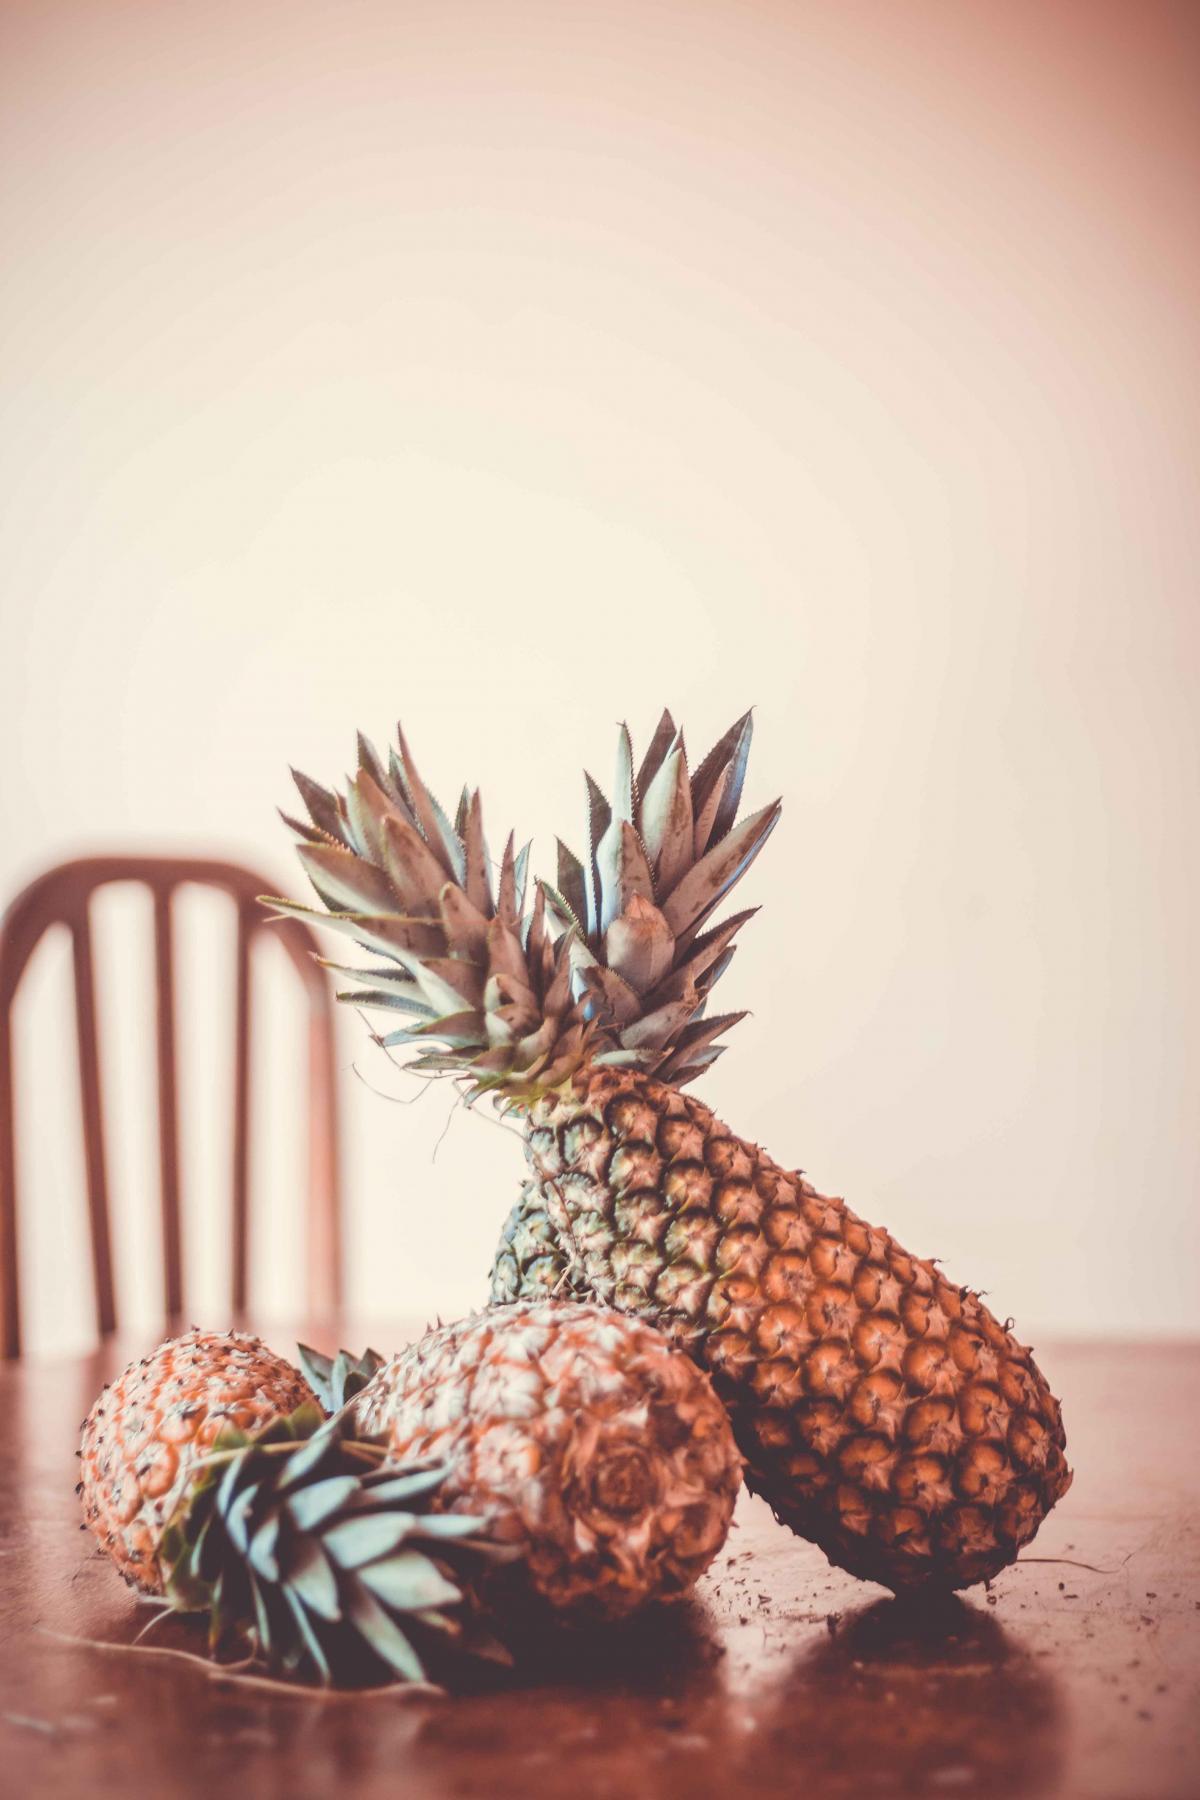 Pineapple Edible fruit Fruit #261437